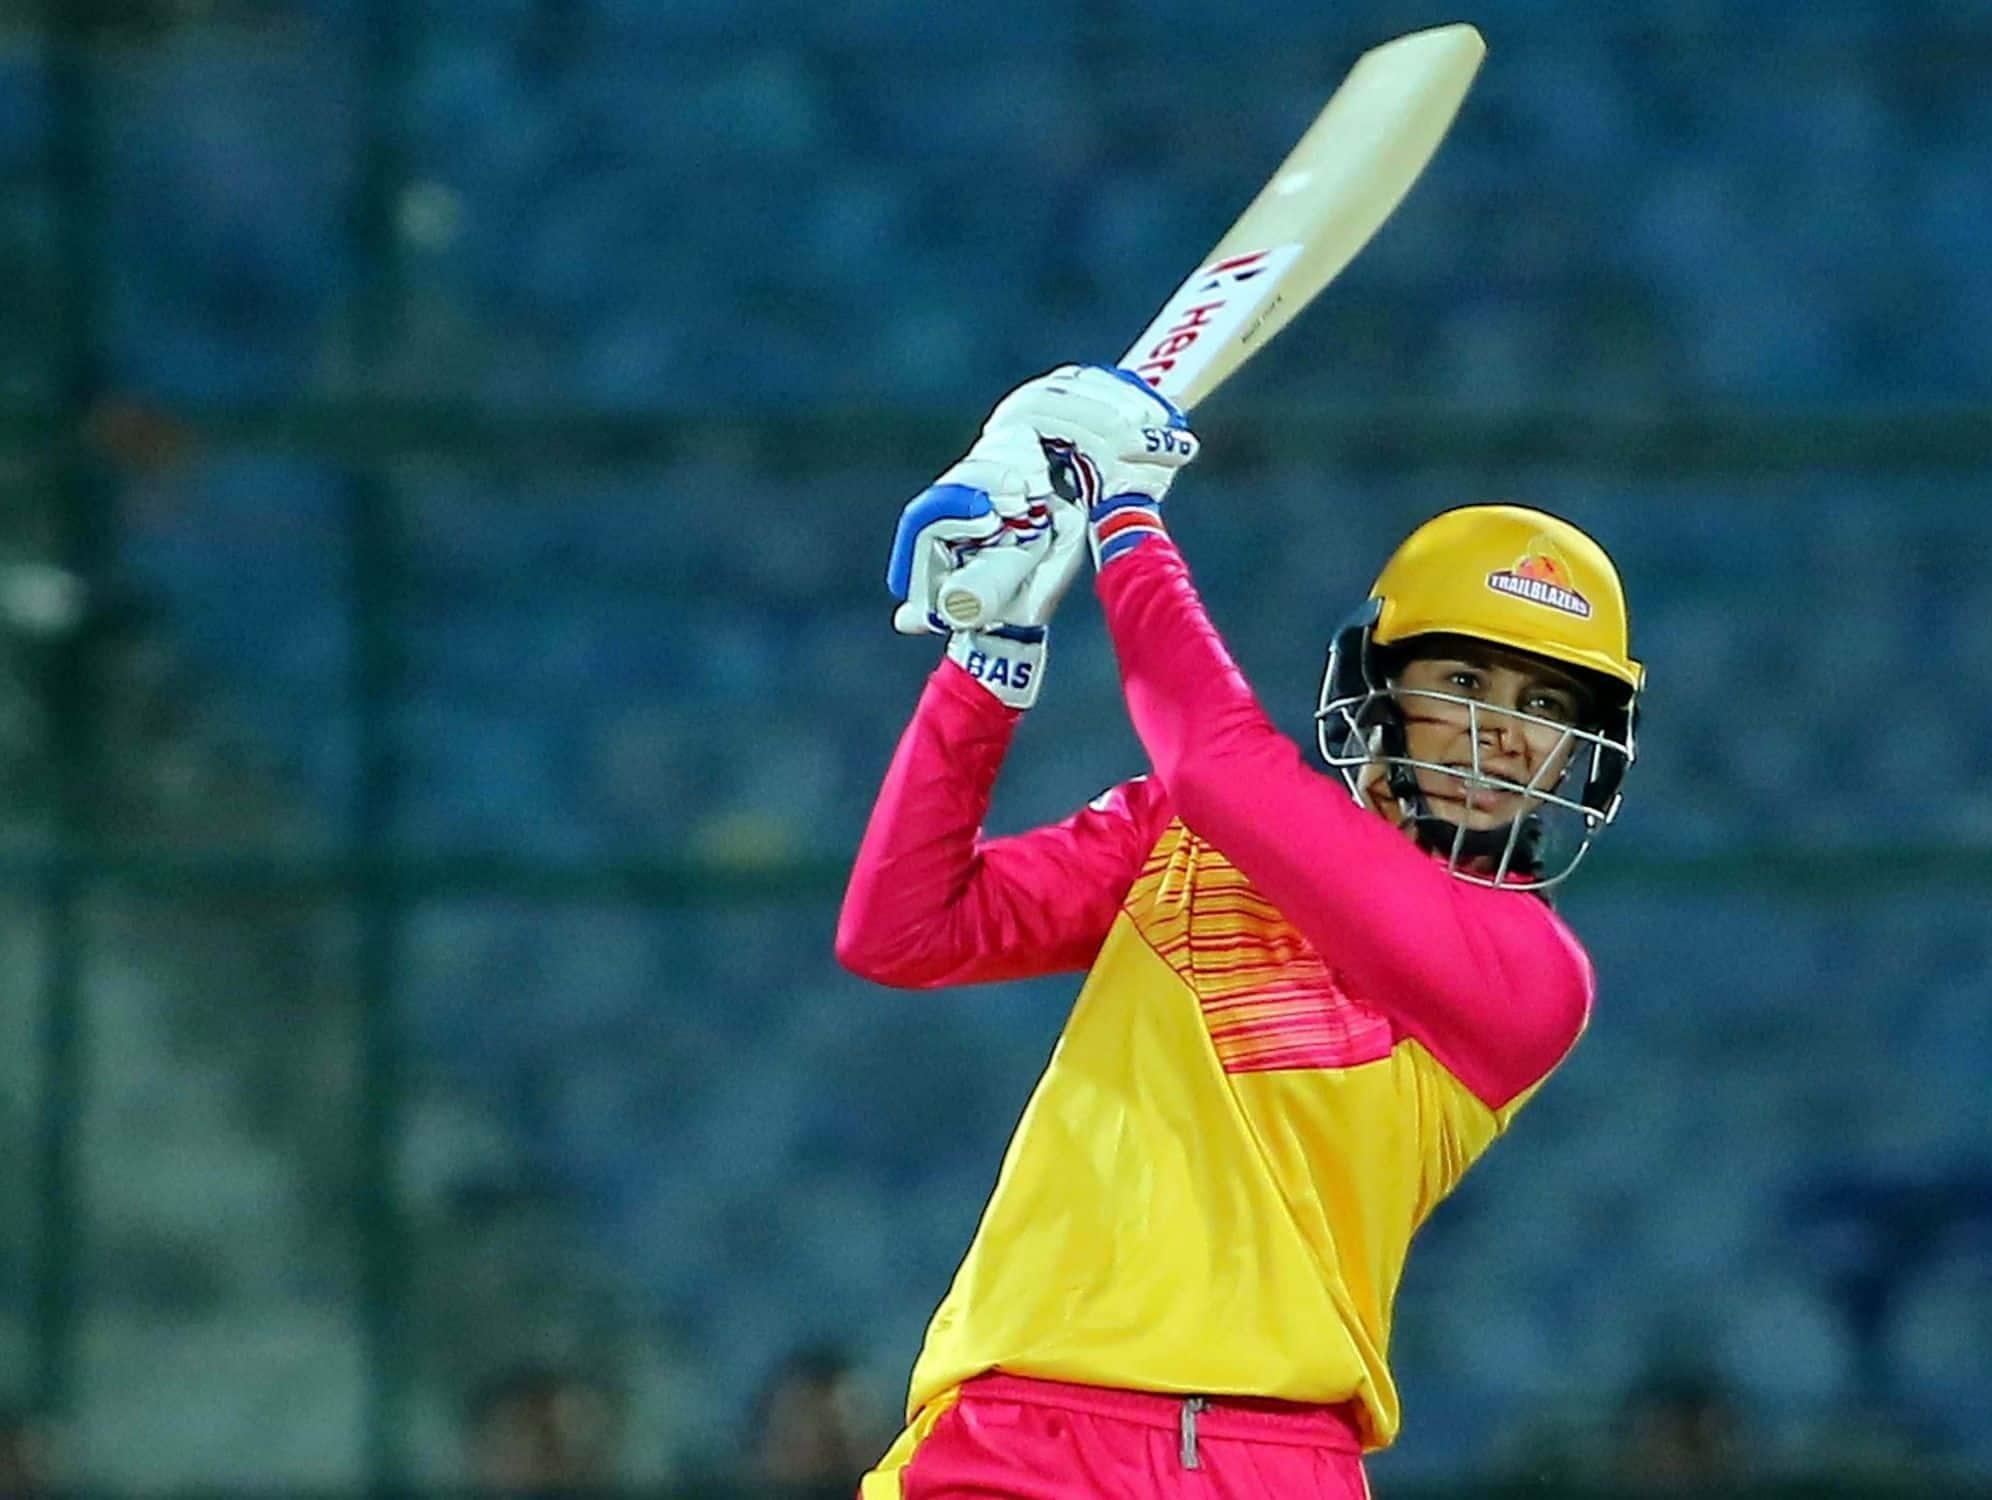 Women's T20 Challenge: Trailblazers beat Supernovas by 2 runs, Smriti mandhana shines